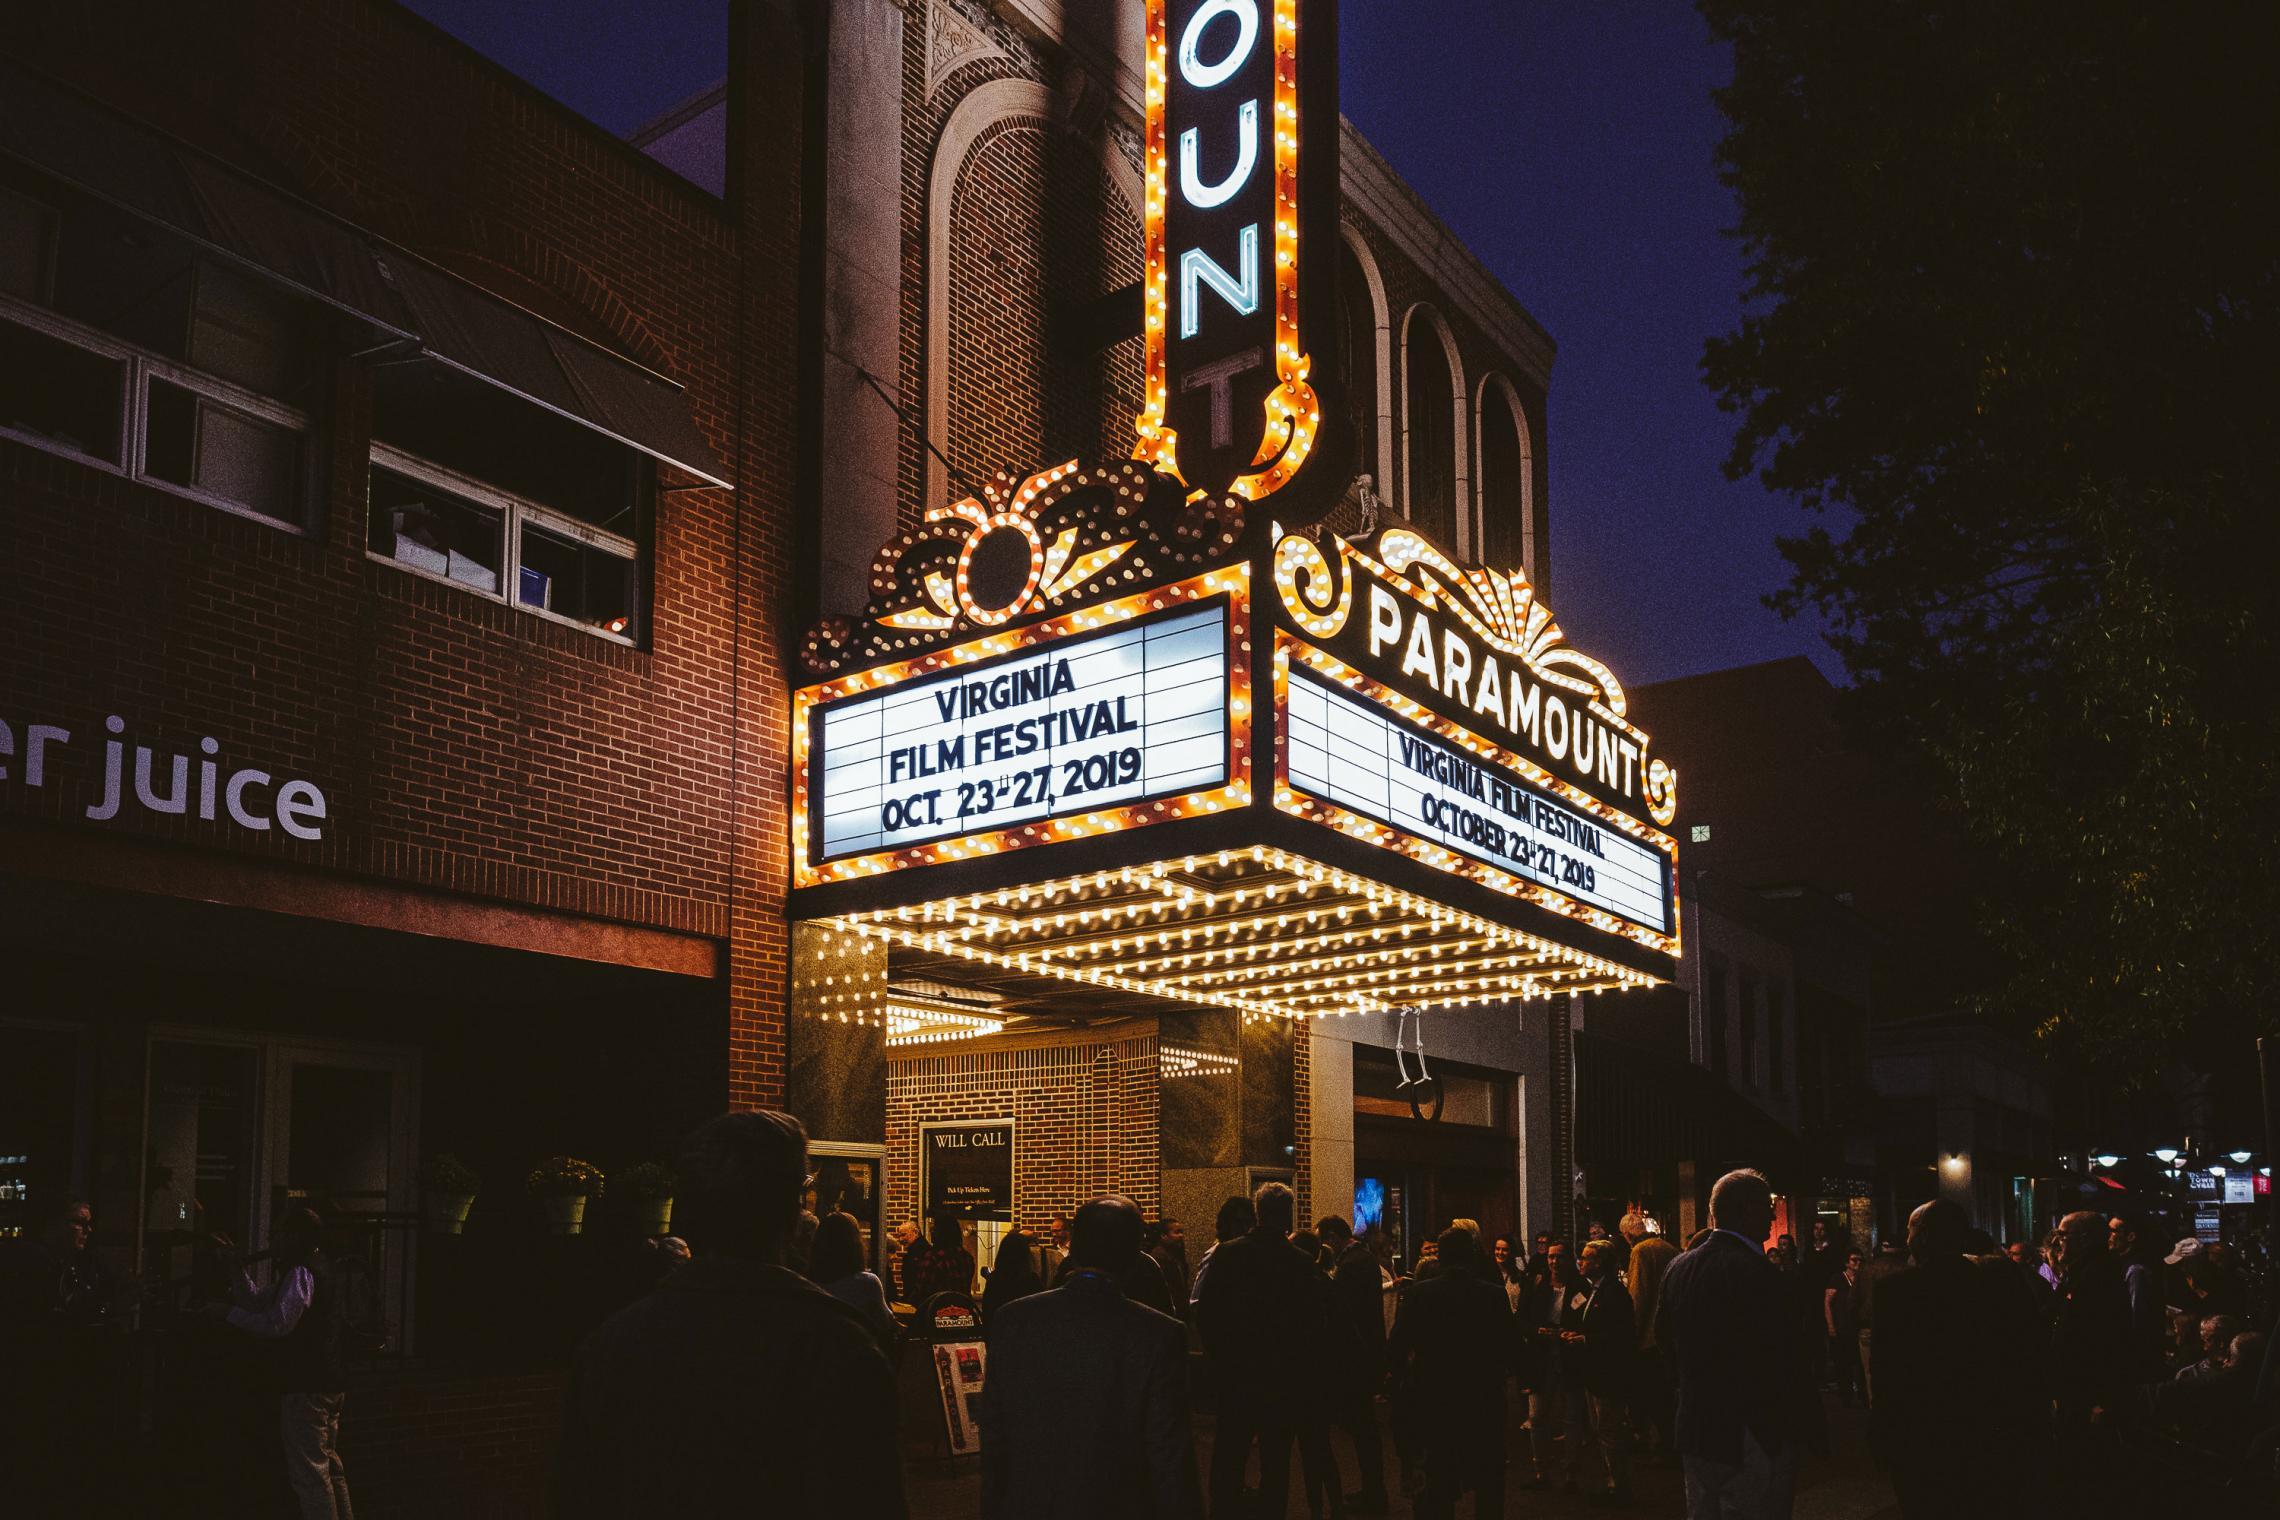 The Virginia Film Festival began Wednesday and will run through Sunday. (Photo by Eze Amos)